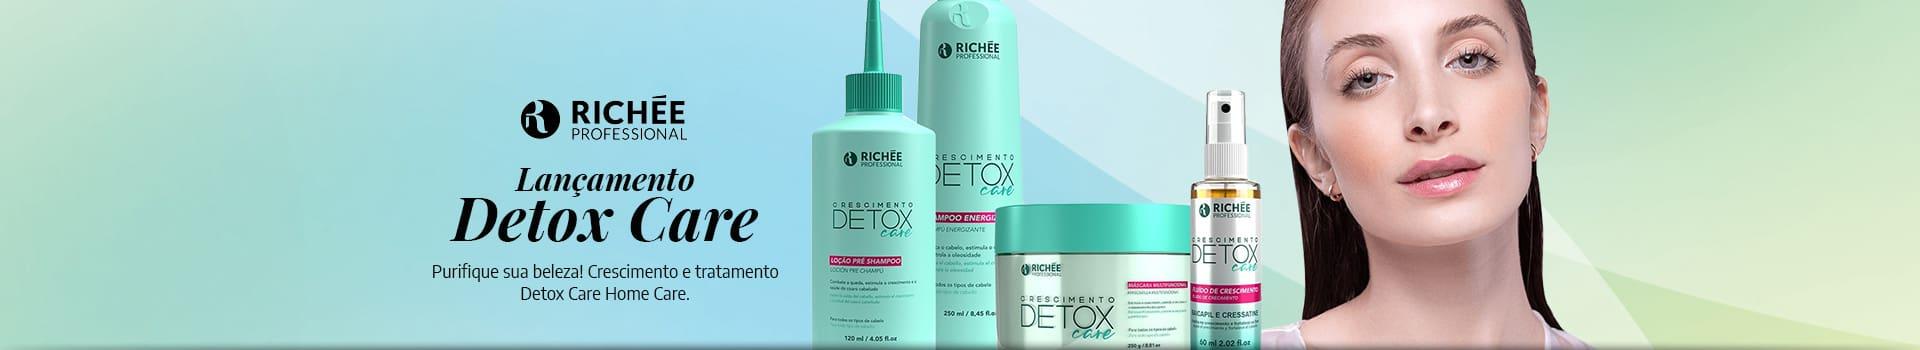 Lançamento Detox Care Richée